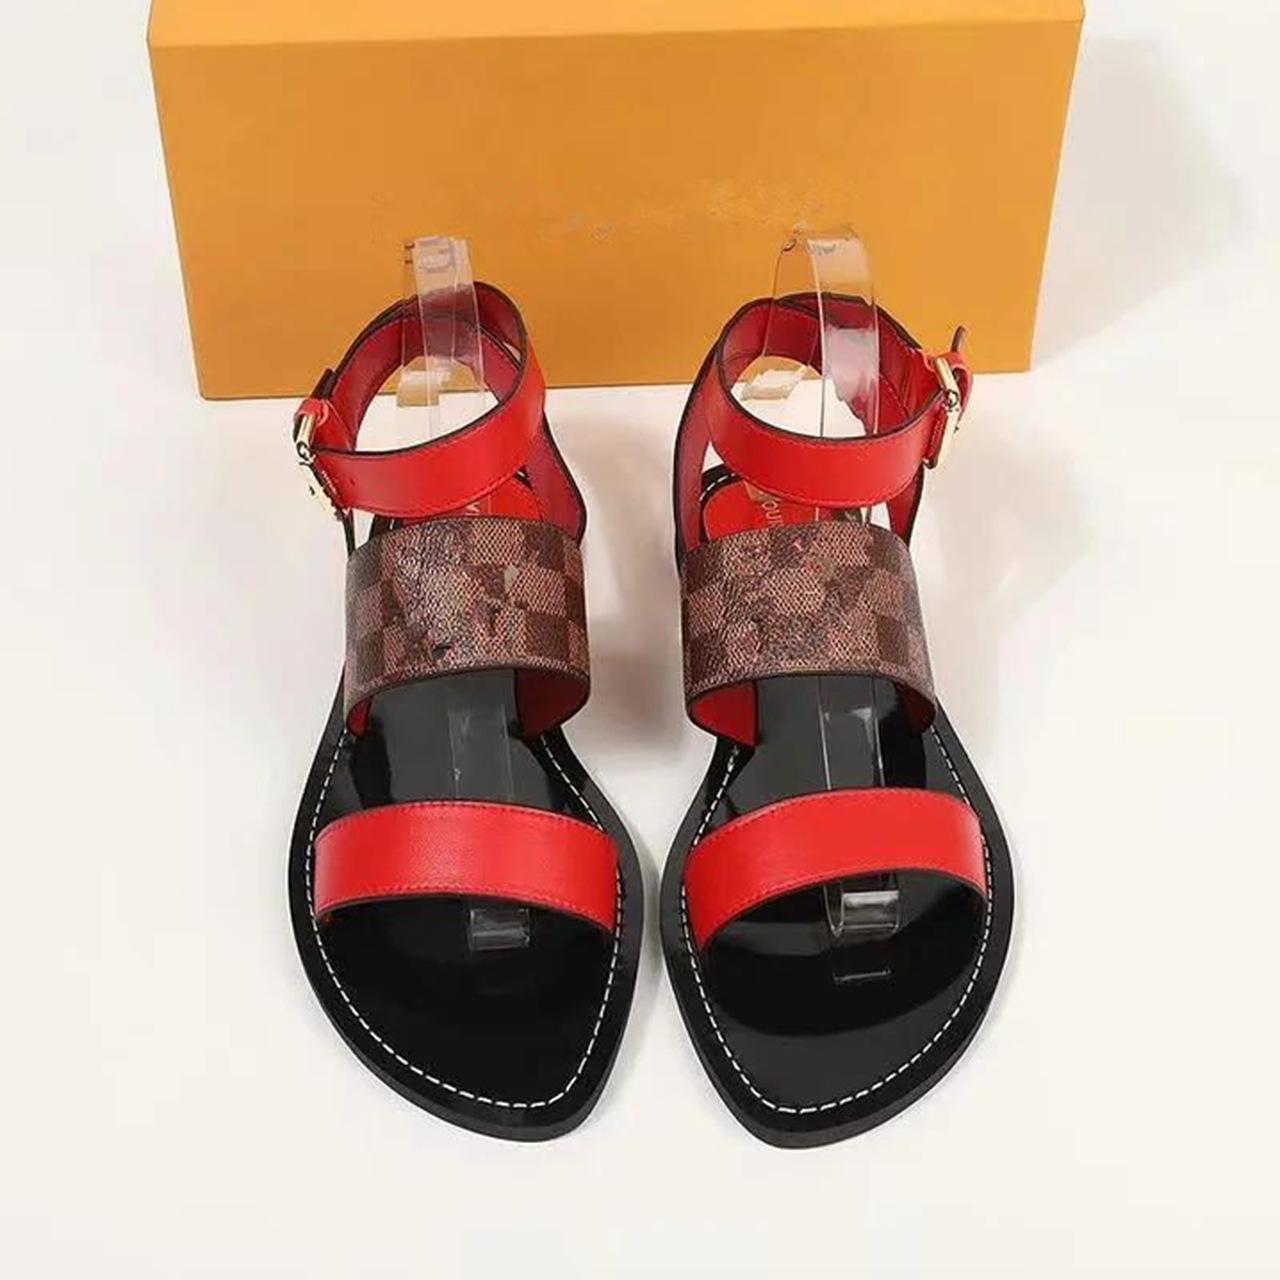 Sandálias femininas confortáveis da Louis Vuitton